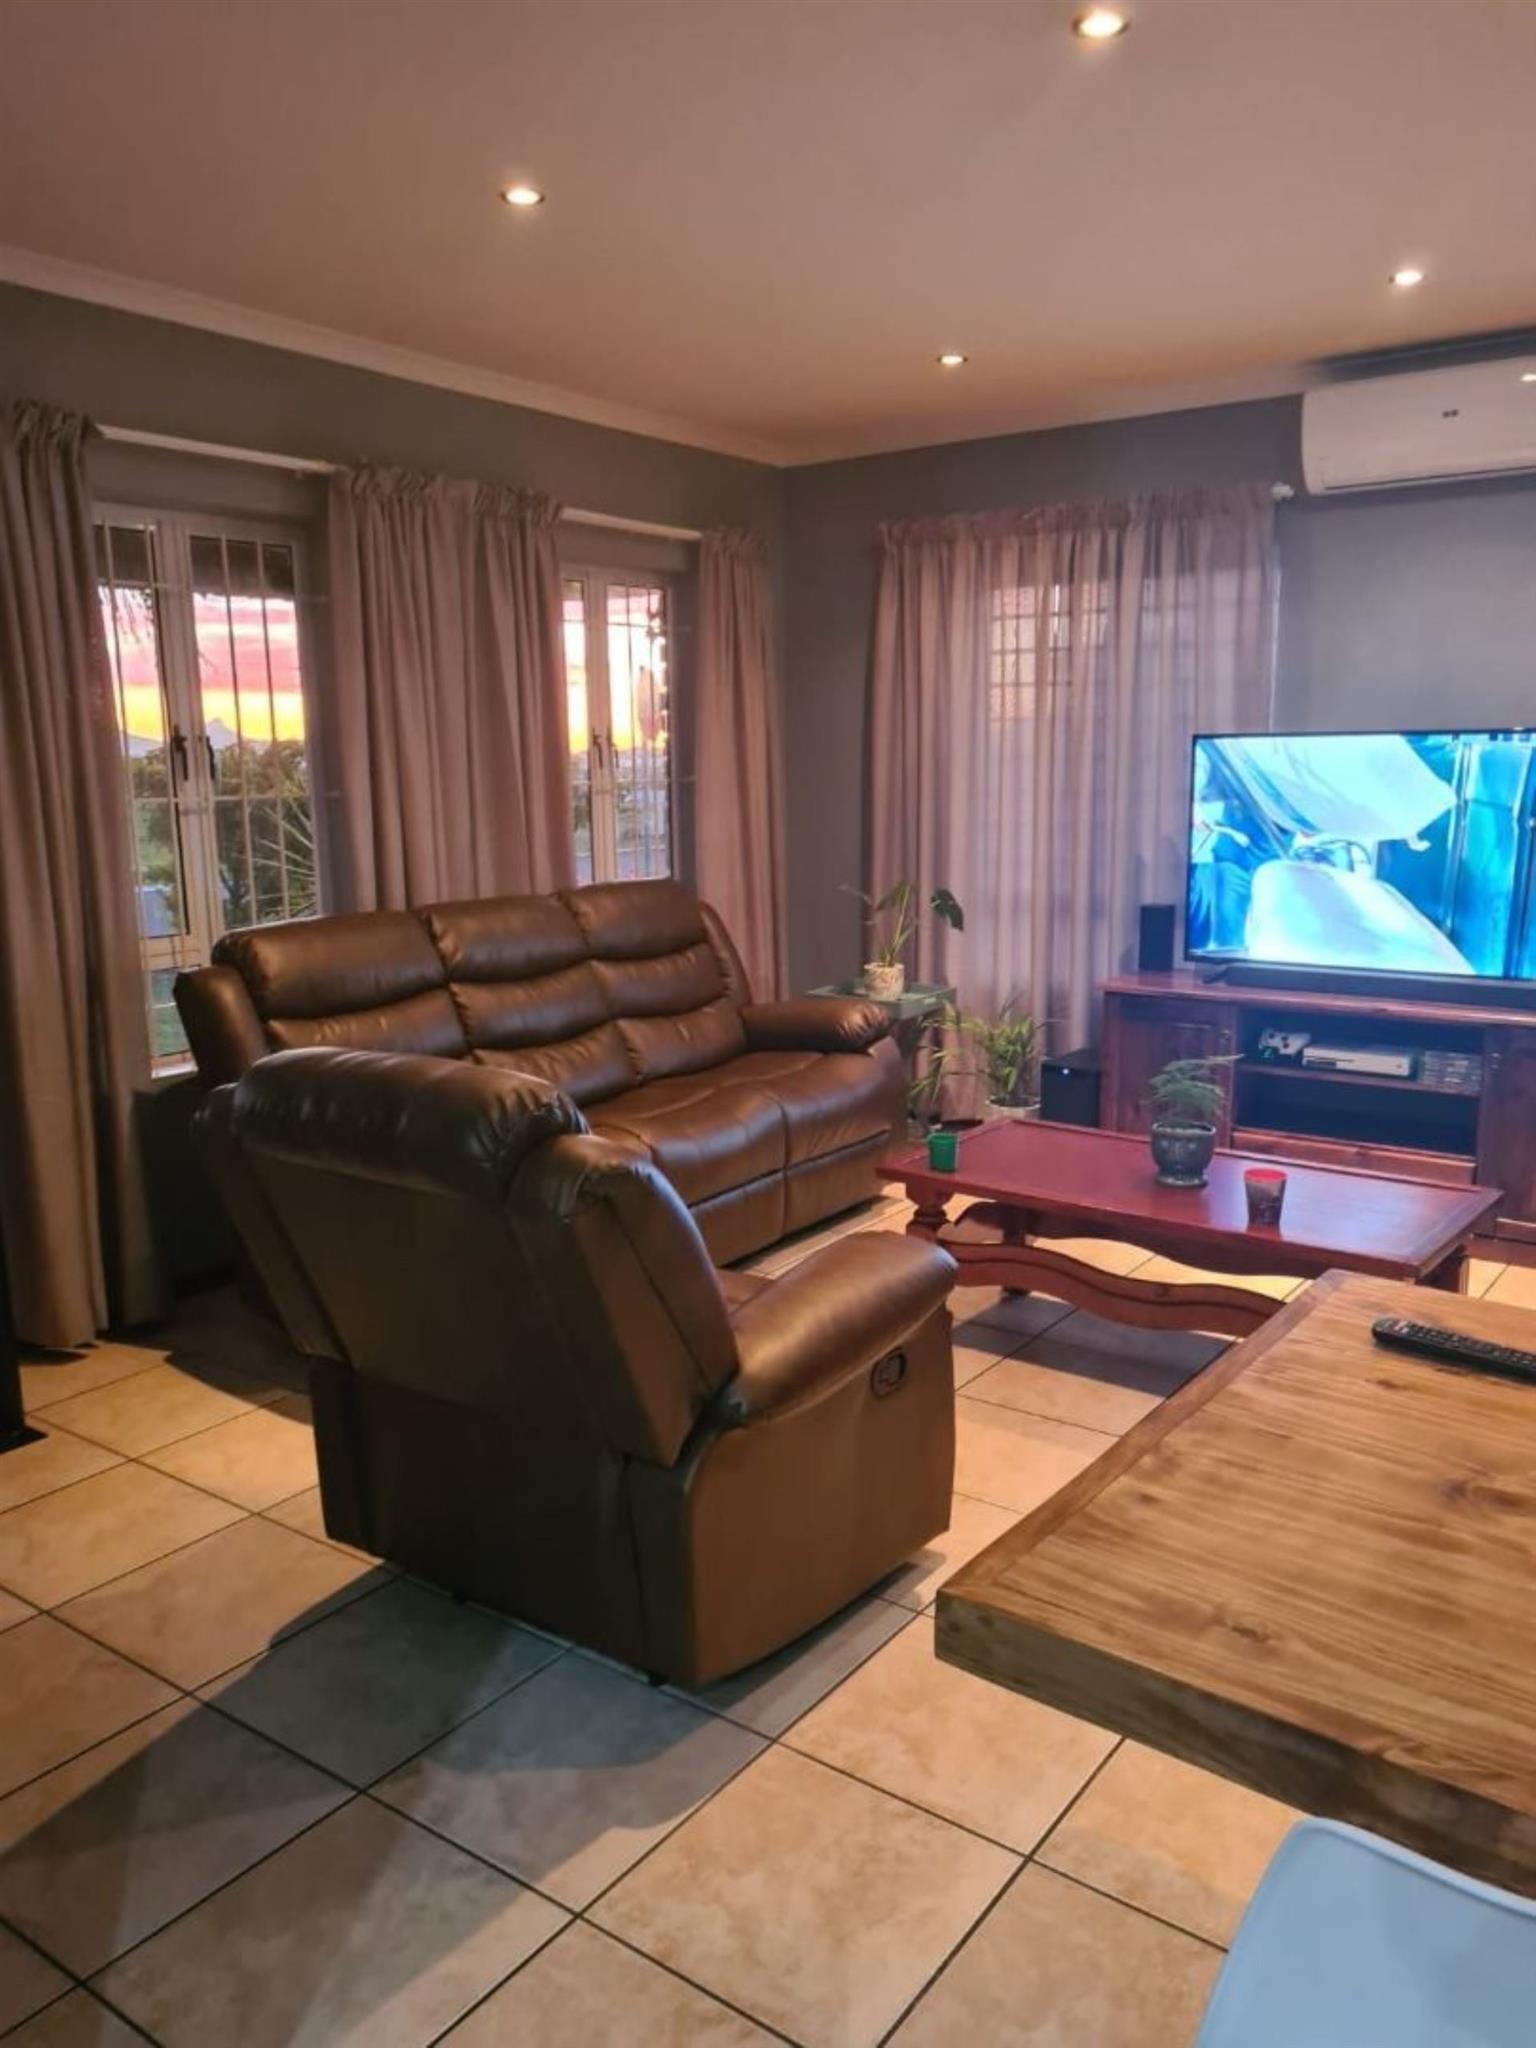 House Rental Monthly in Jacarandas